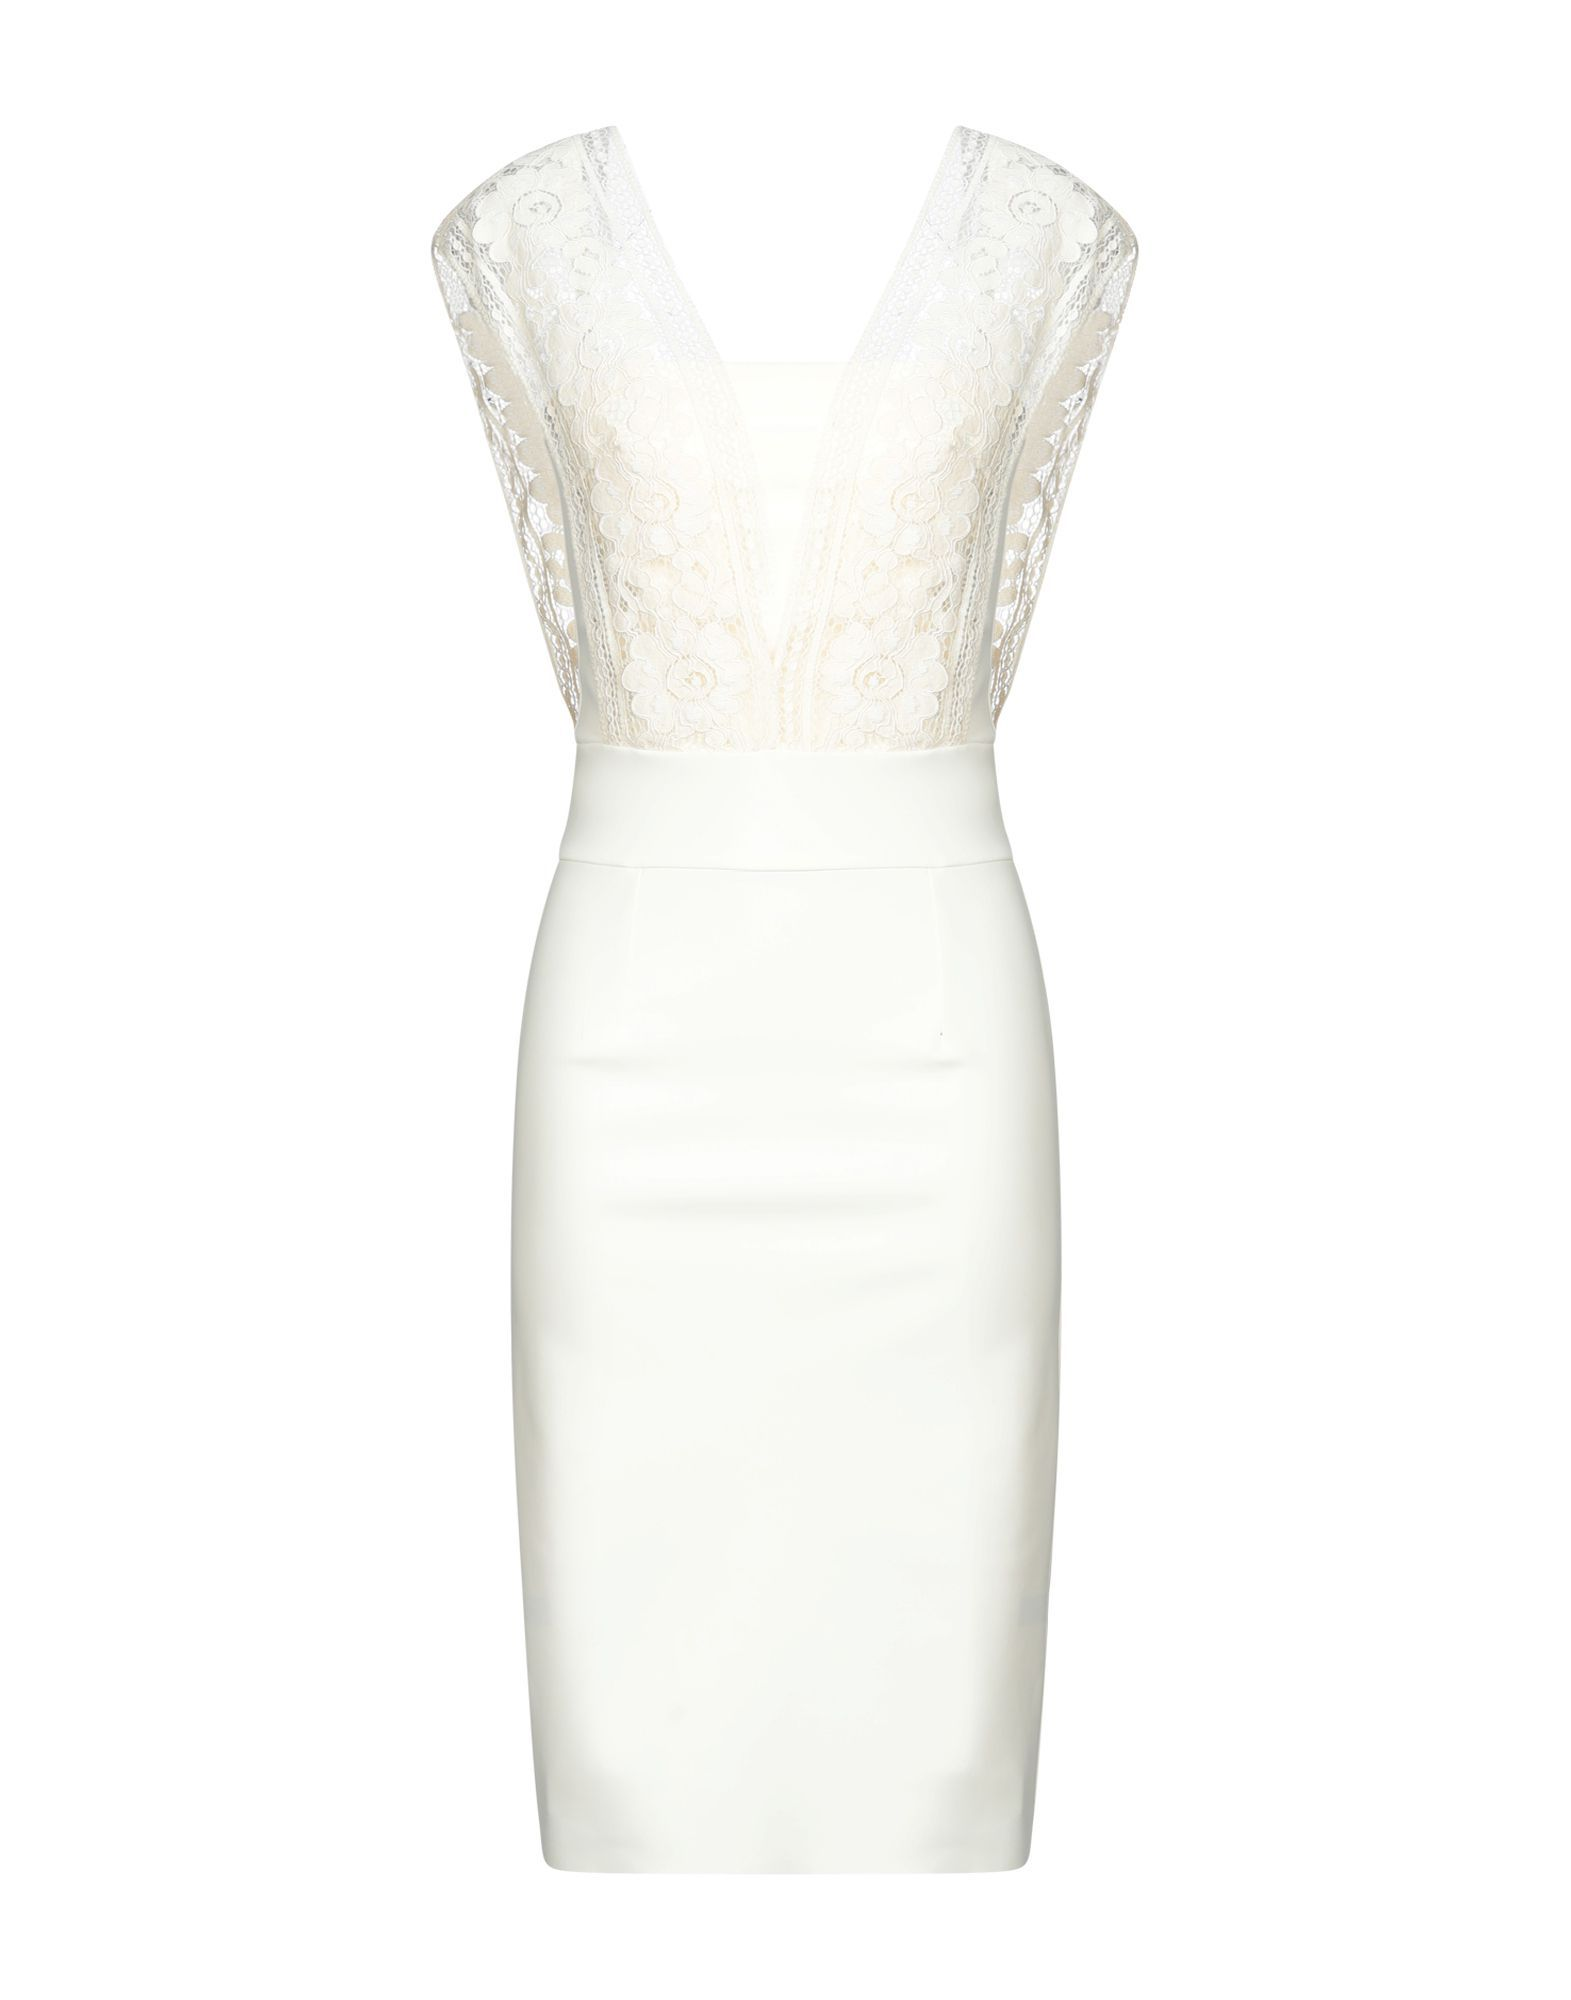 Christies A Porter Ivory Lace Dress